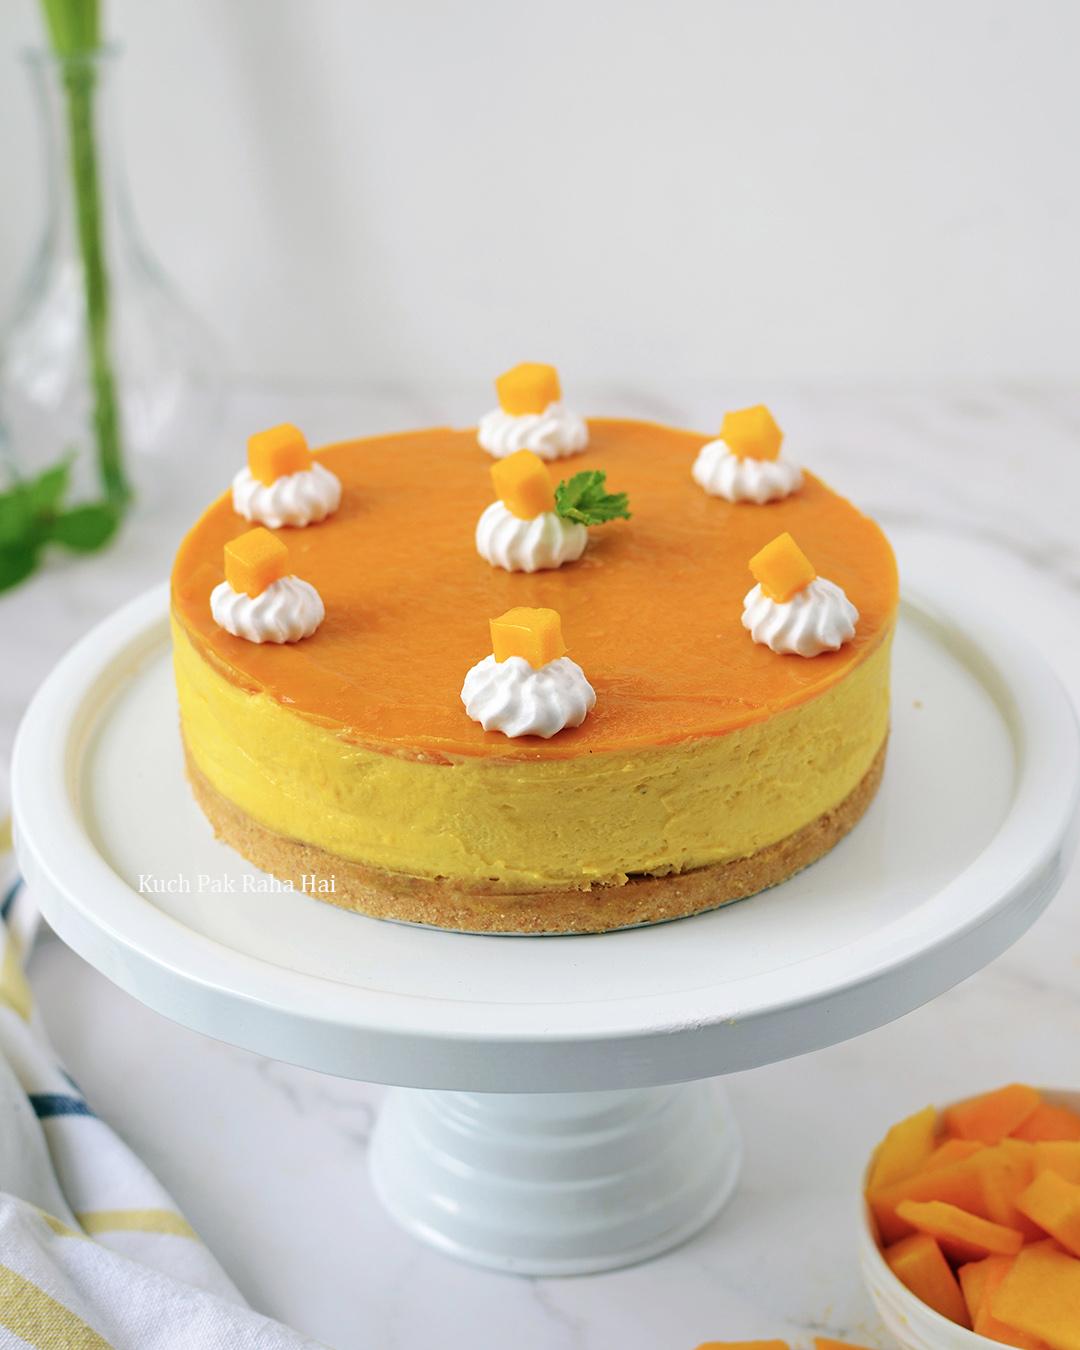 Eggless Mango Cheesecake without gelatin